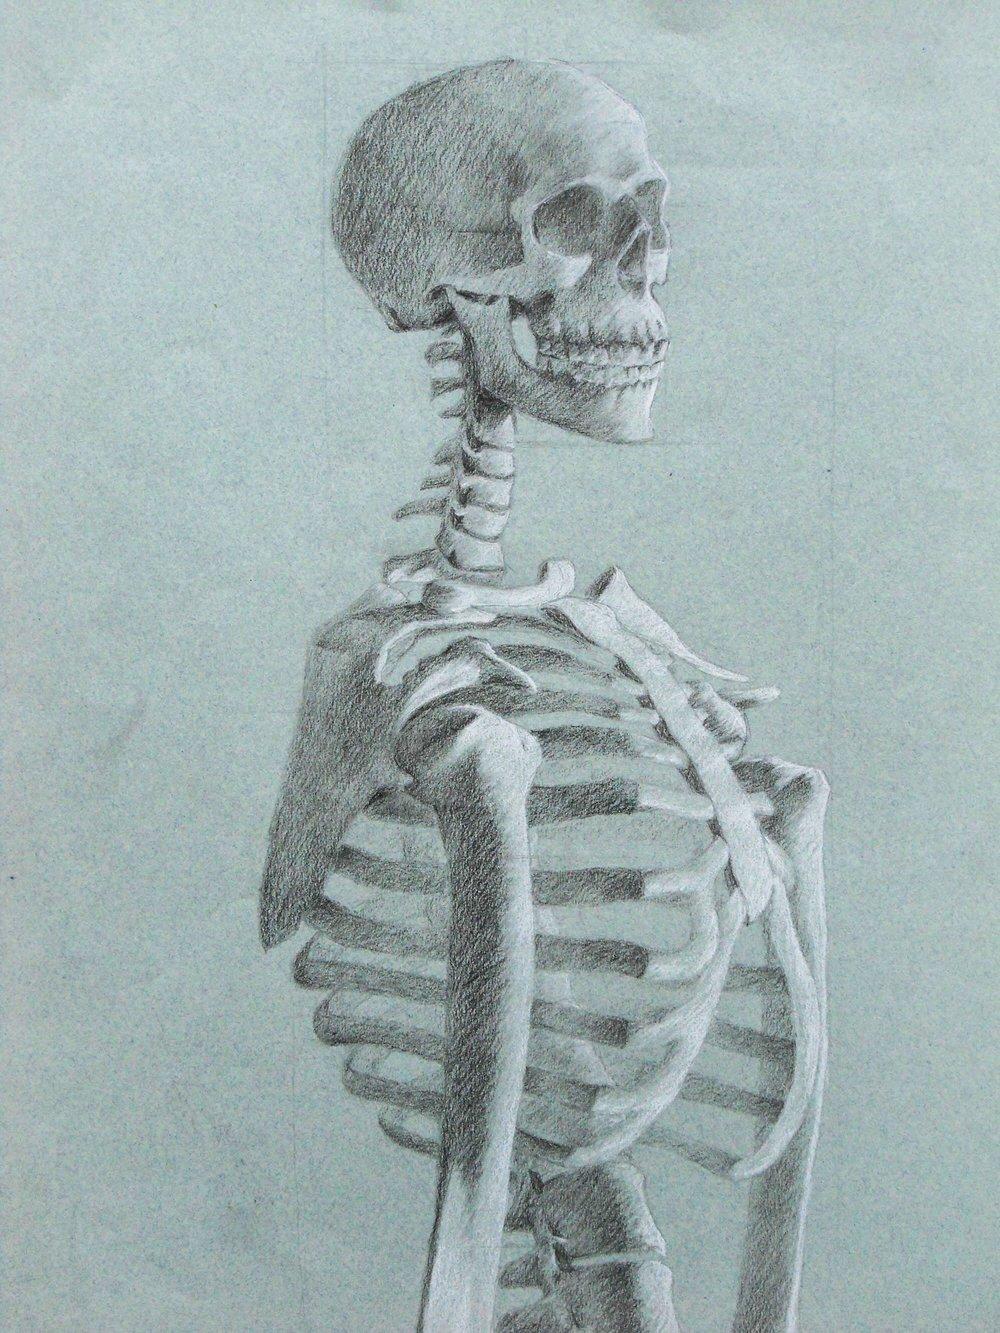 Skeleton Study - Kipp T. Jarden